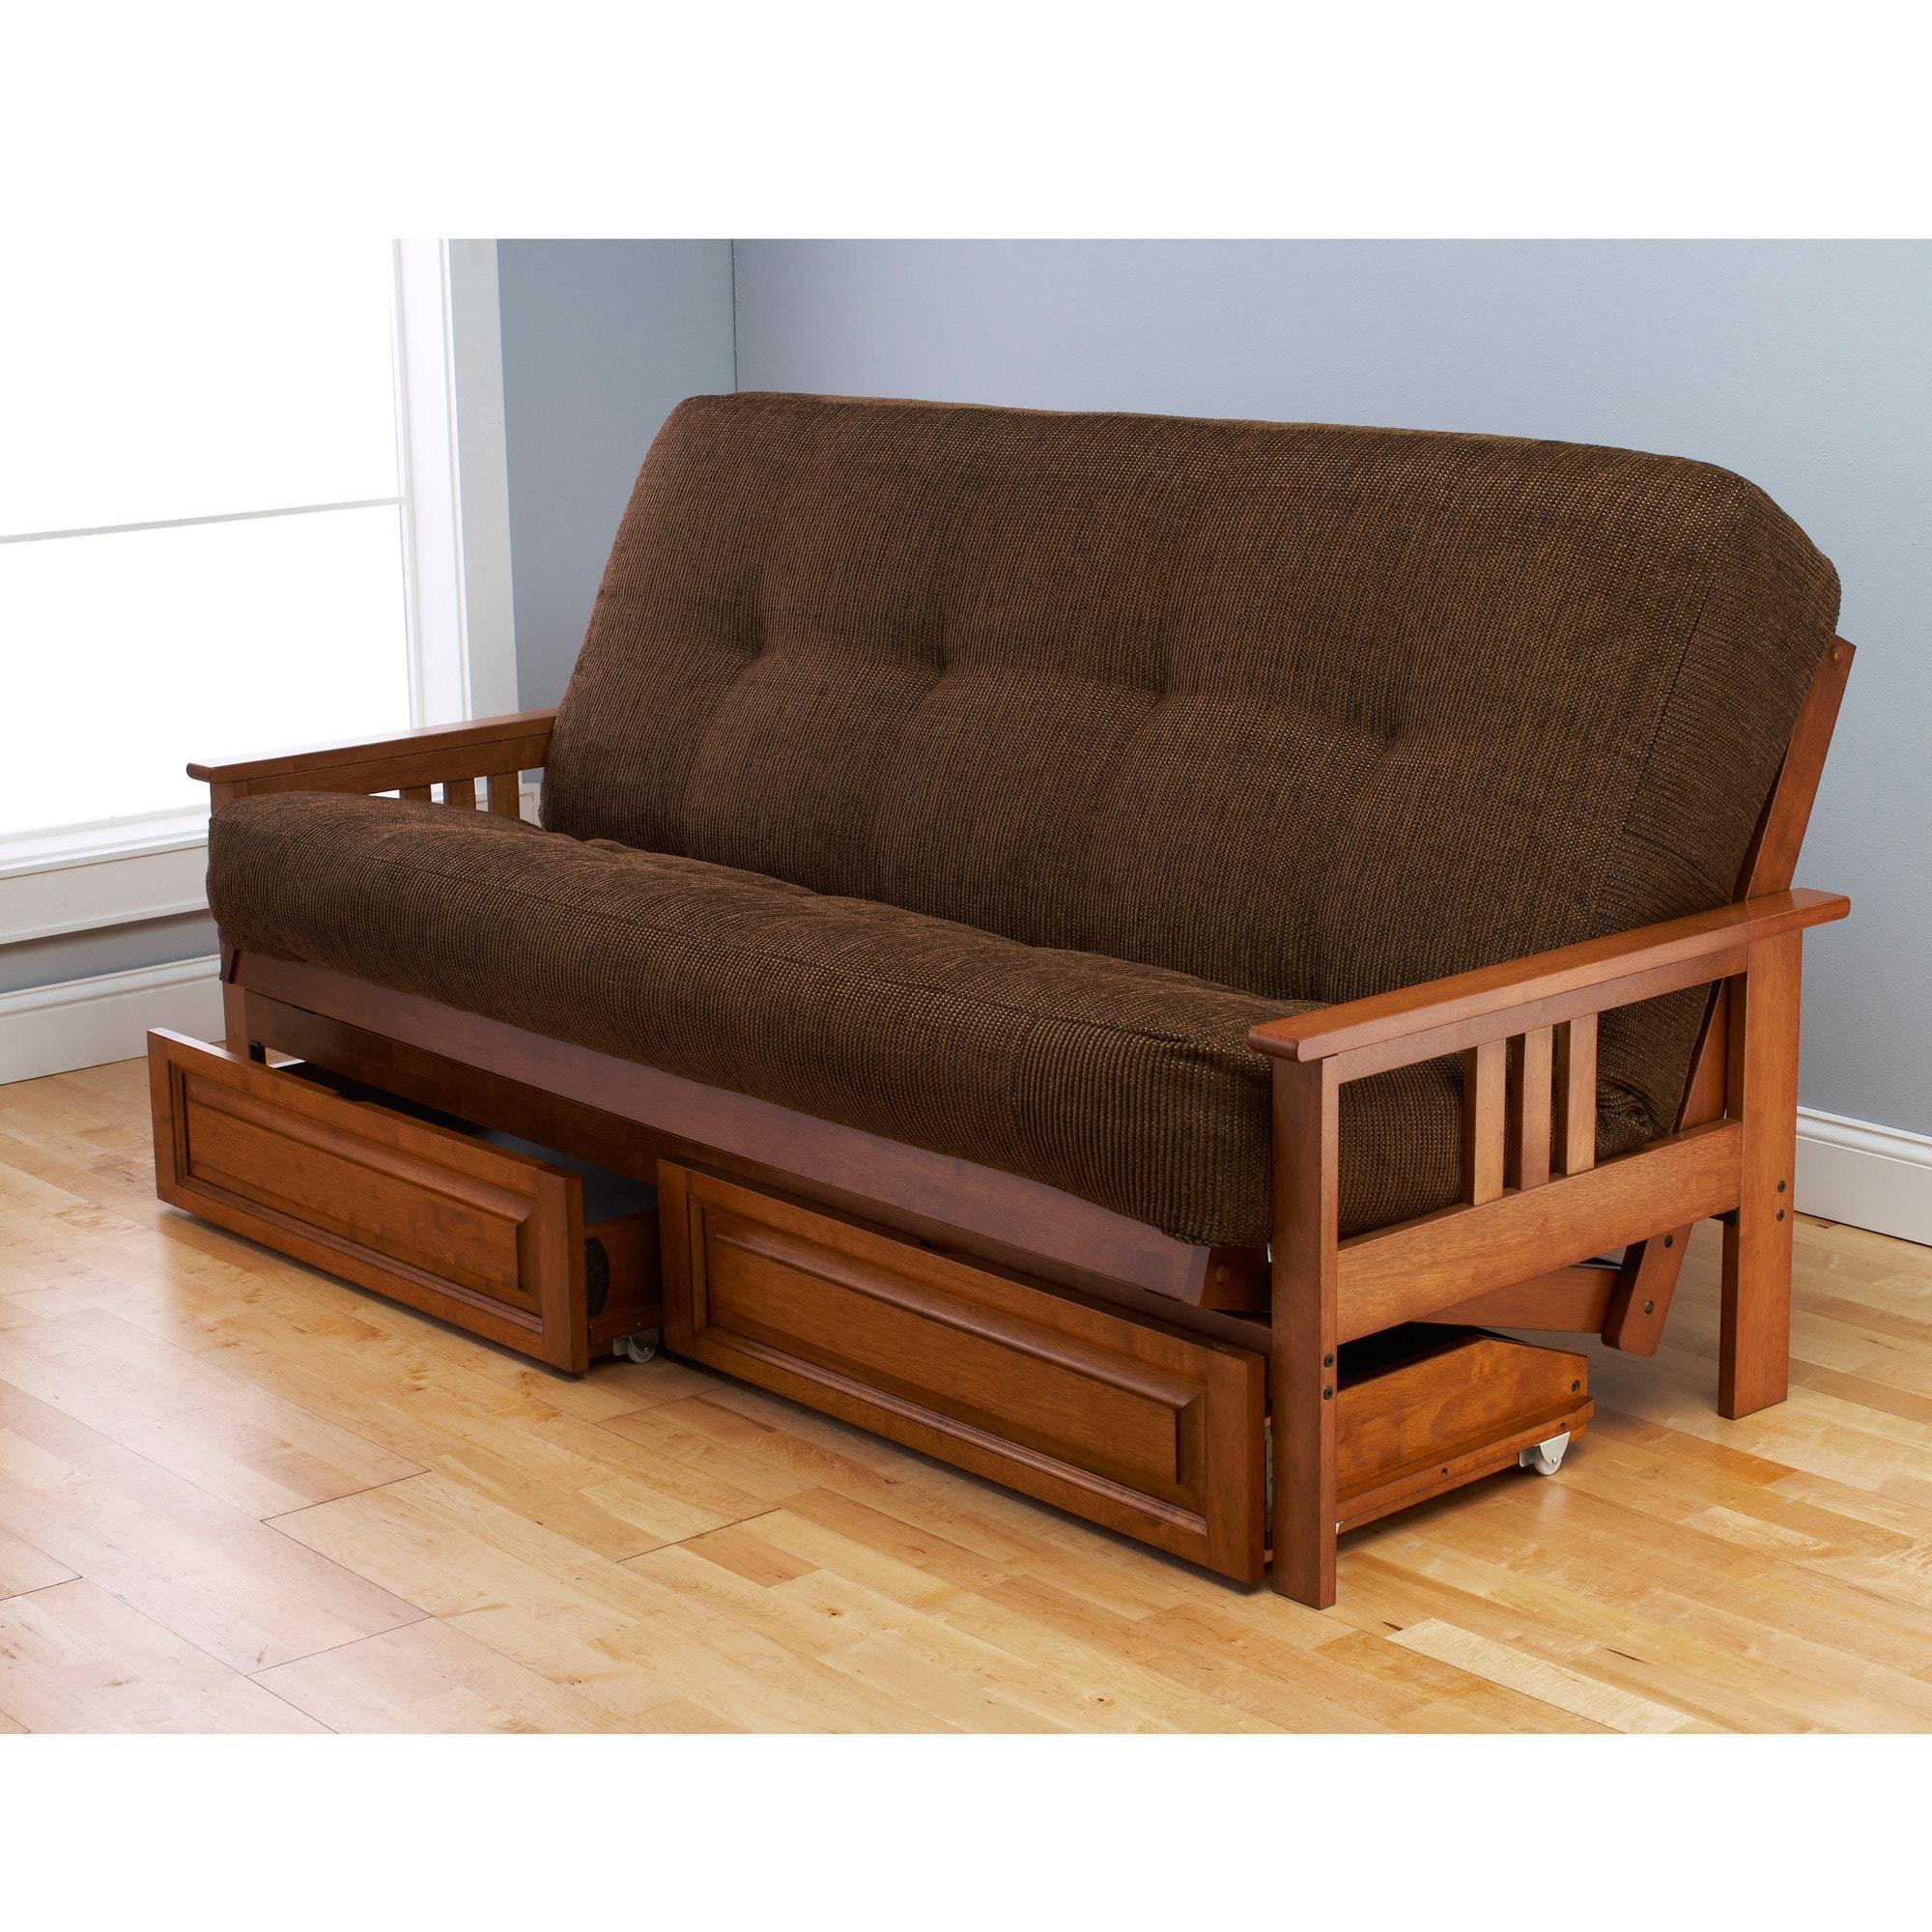 Somette Beli Mont Multi-flex Honey Oak Full-size Futon Frame, Drawers and Mattress Set